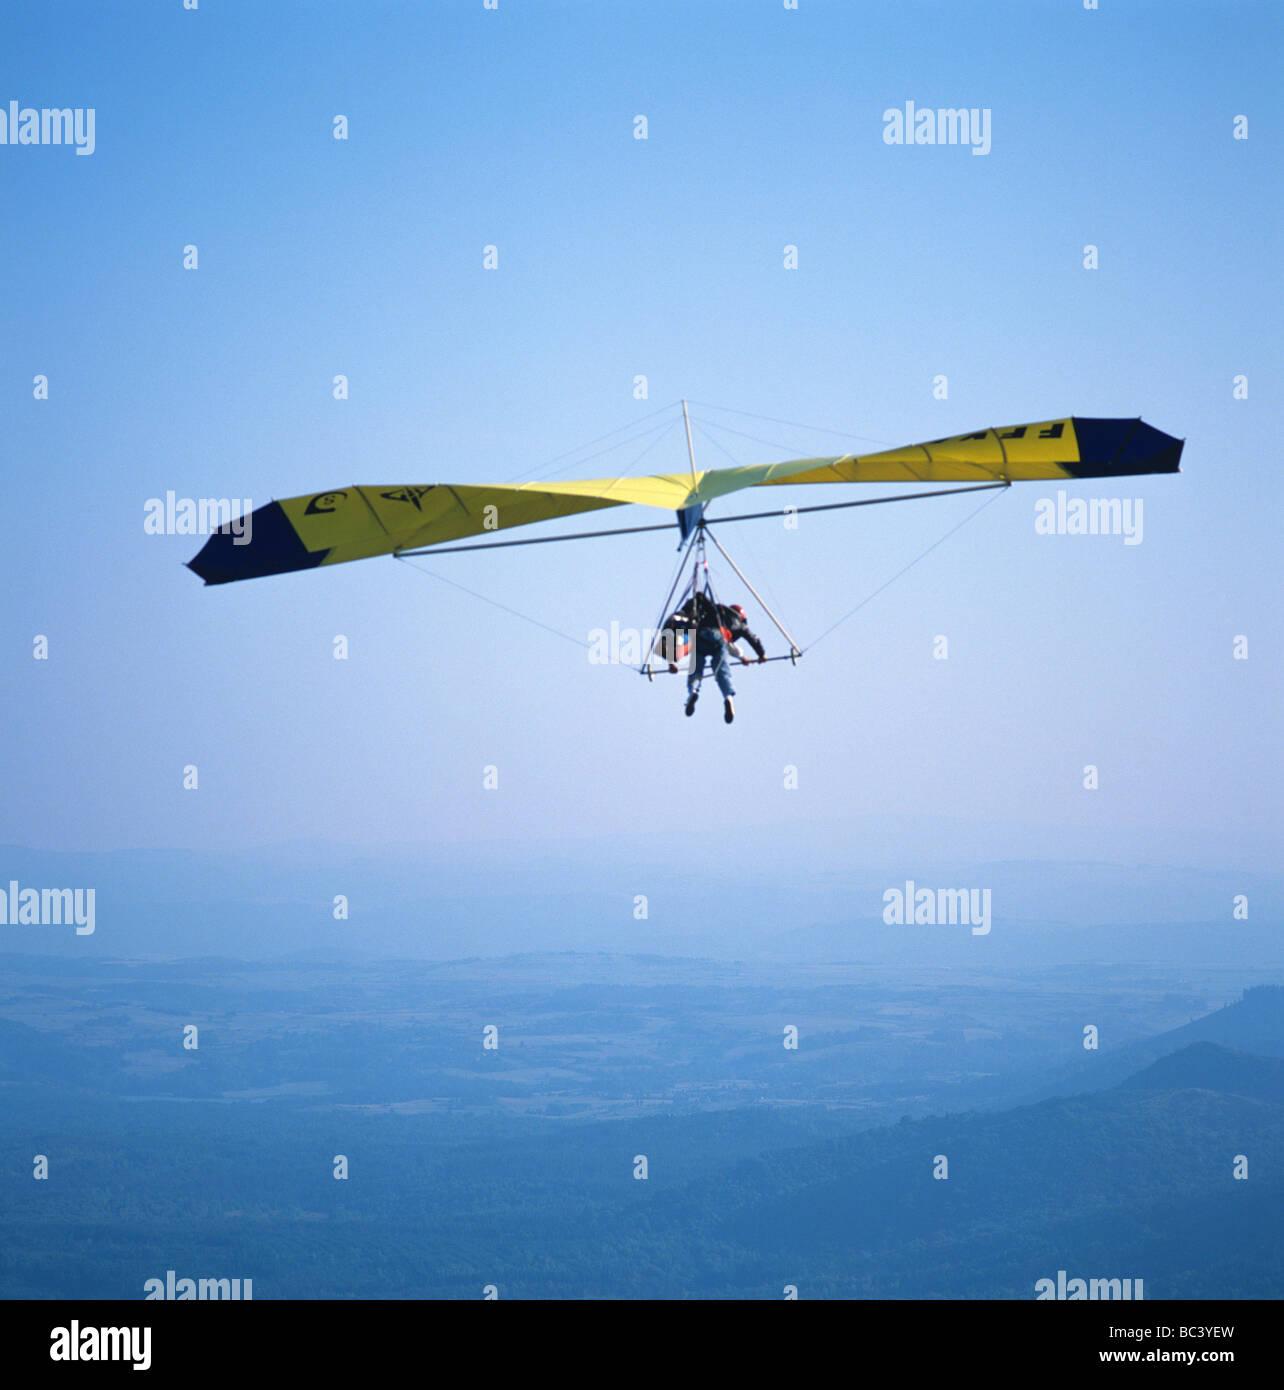 Paragliding : Hang gliding - Stock Image